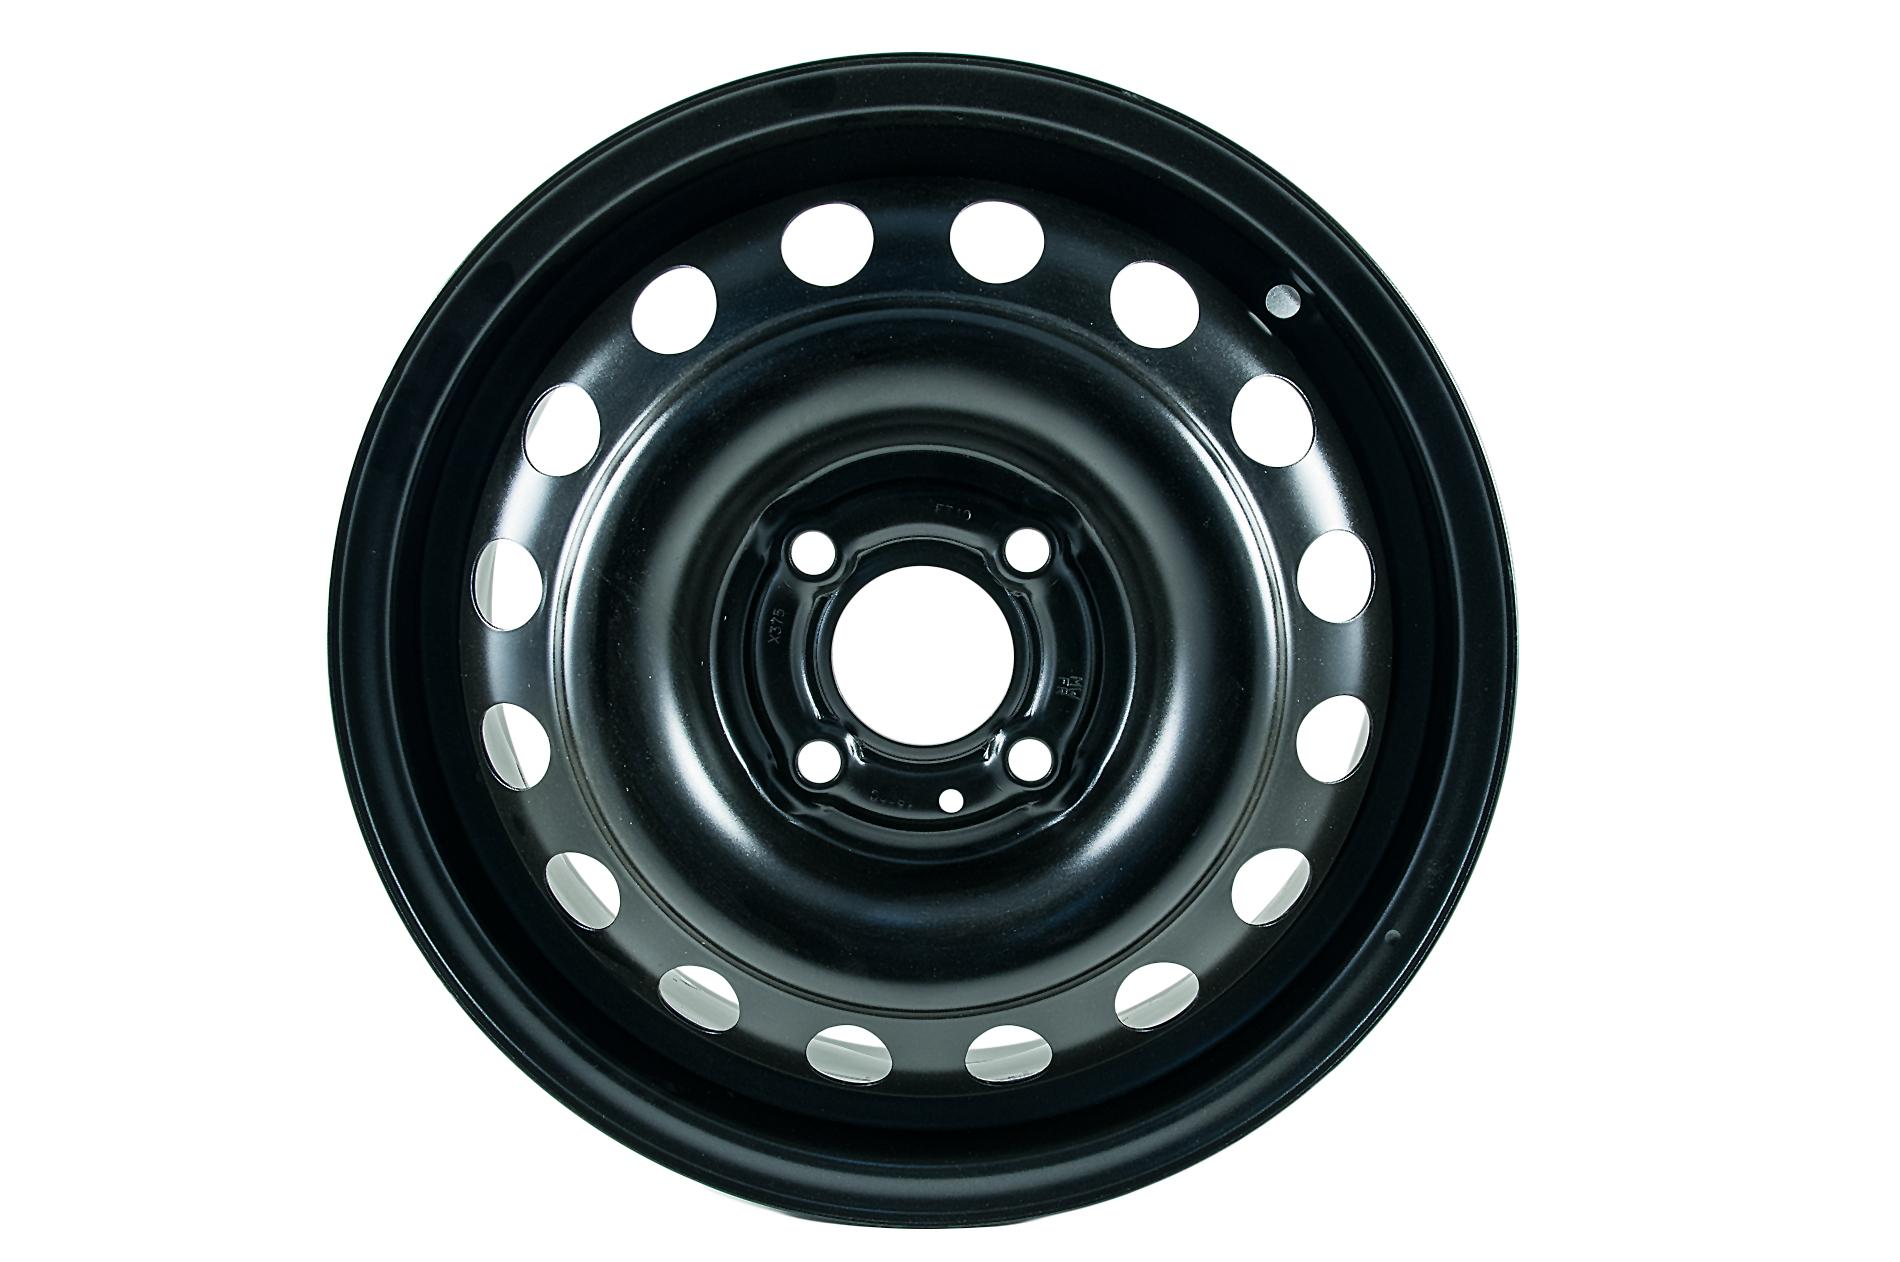 Nissan Genuine Micra K12e 14 Quot Road Spare Wheel Steel Disc